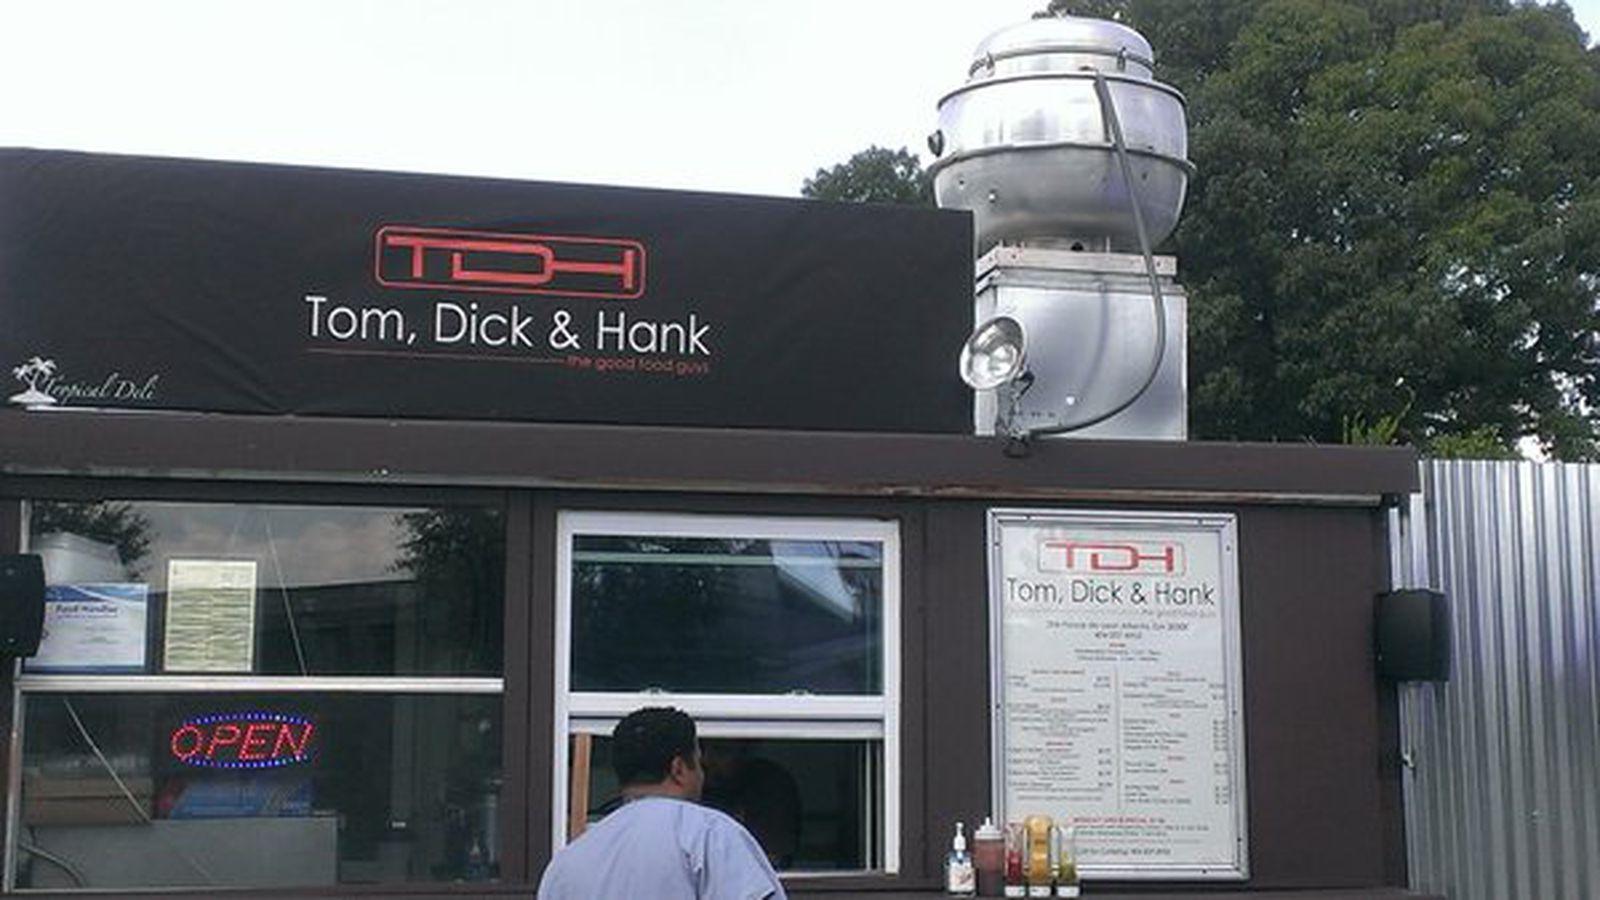 Tom Dick Hank Opens On Ponce In Midtown Eater Atlanta Watermelon Wallpaper Rainbow Find Free HD for Desktop [freshlhys.tk]